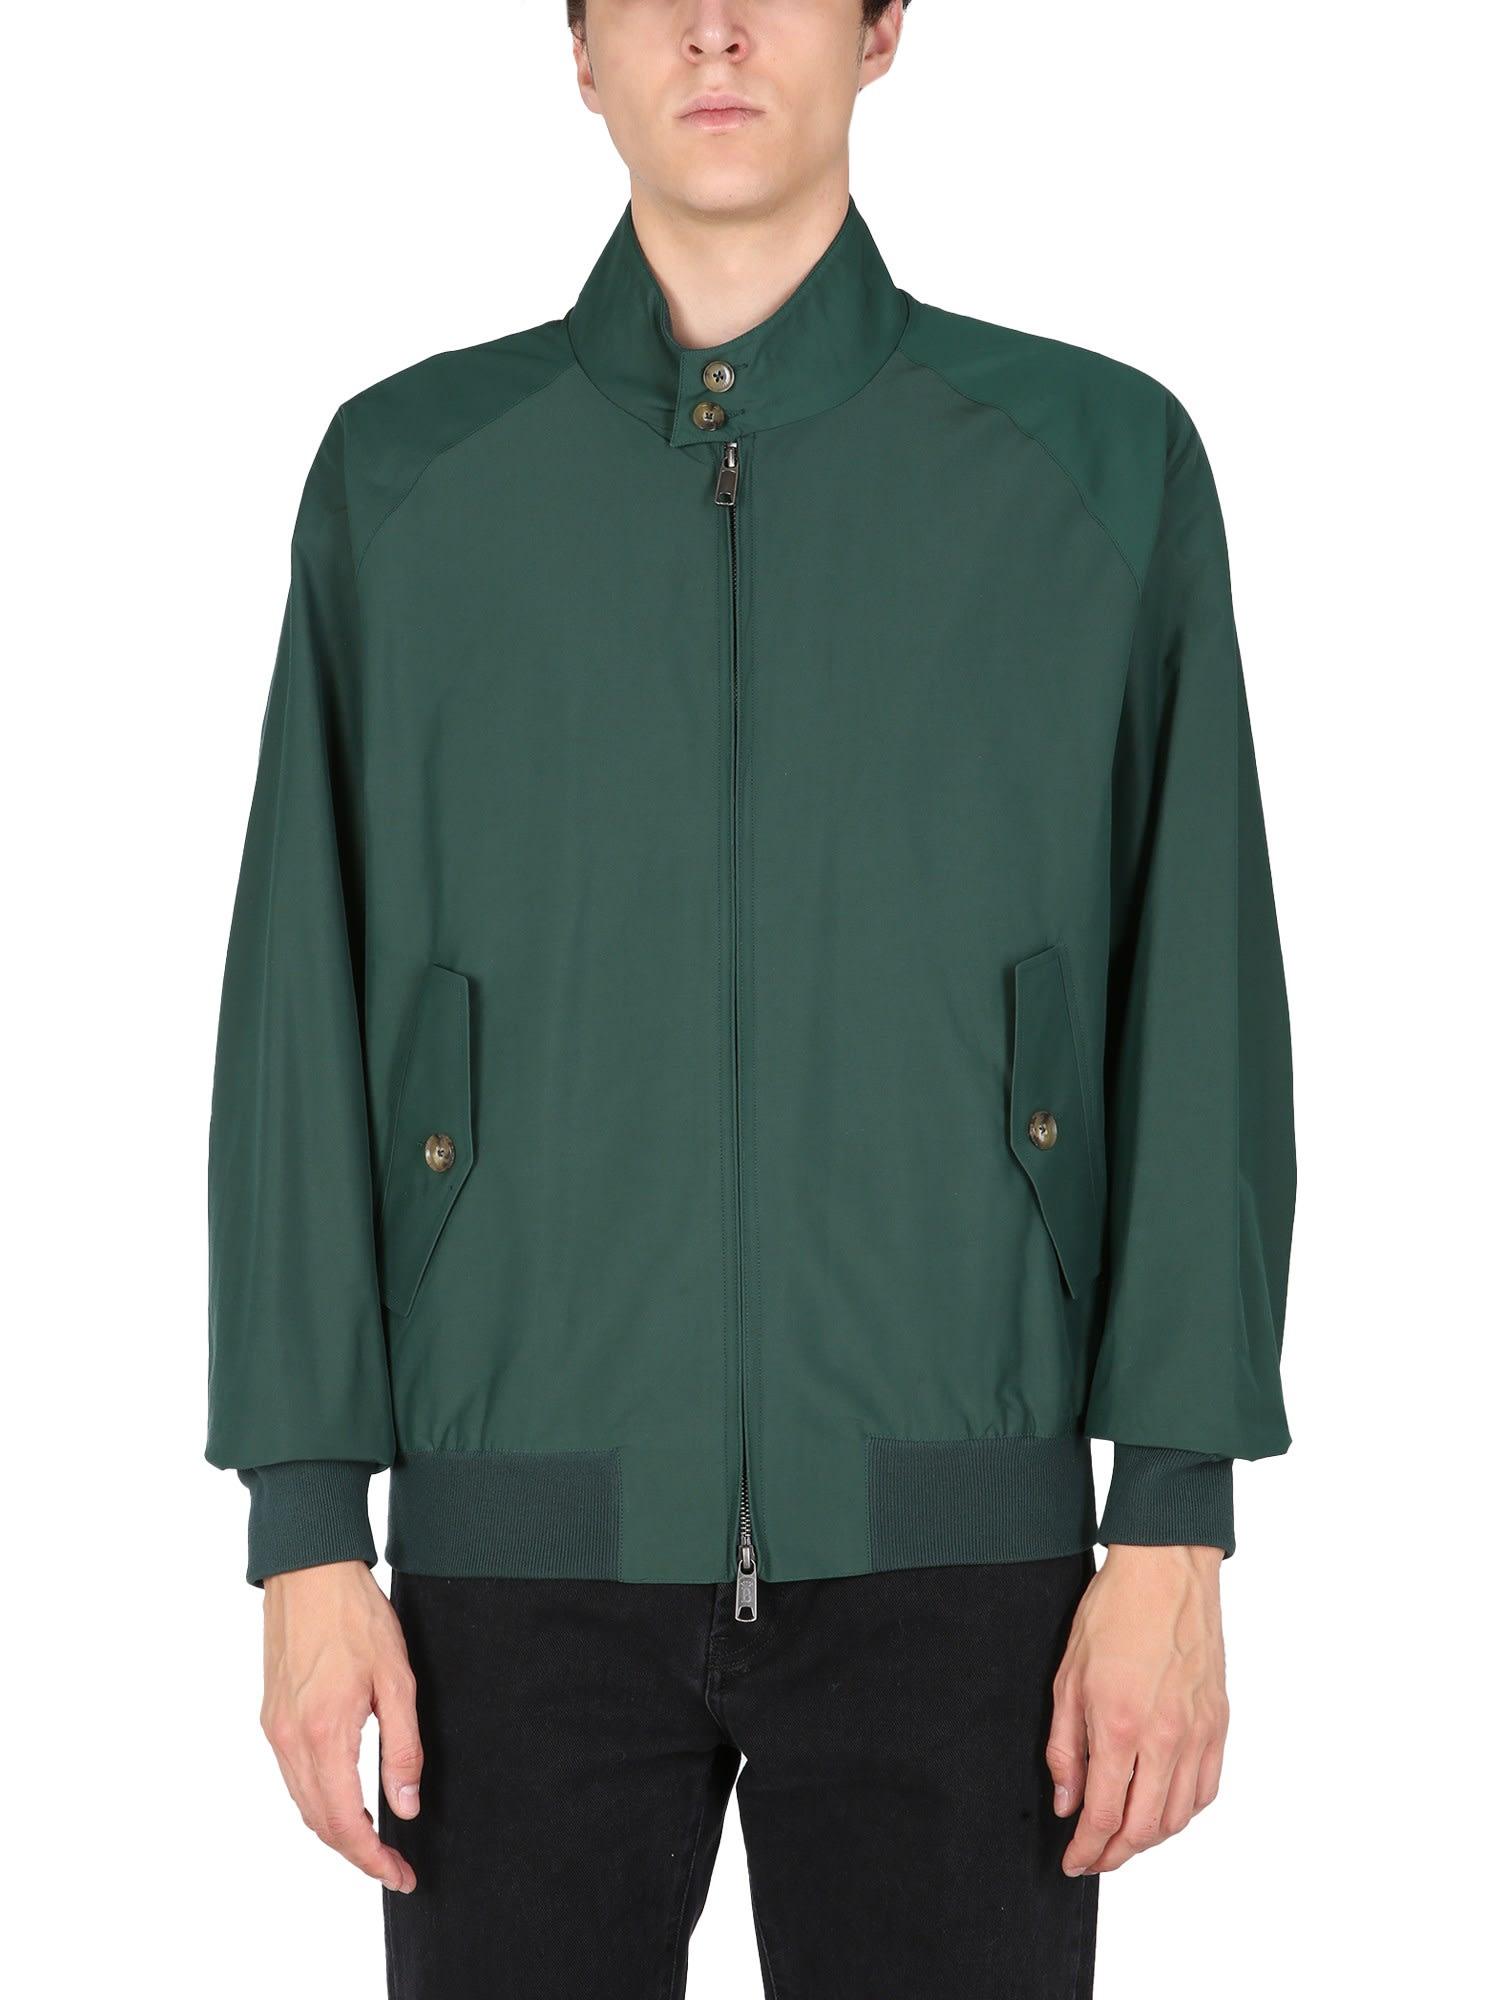 G9 Harrington Jacket Baracuta